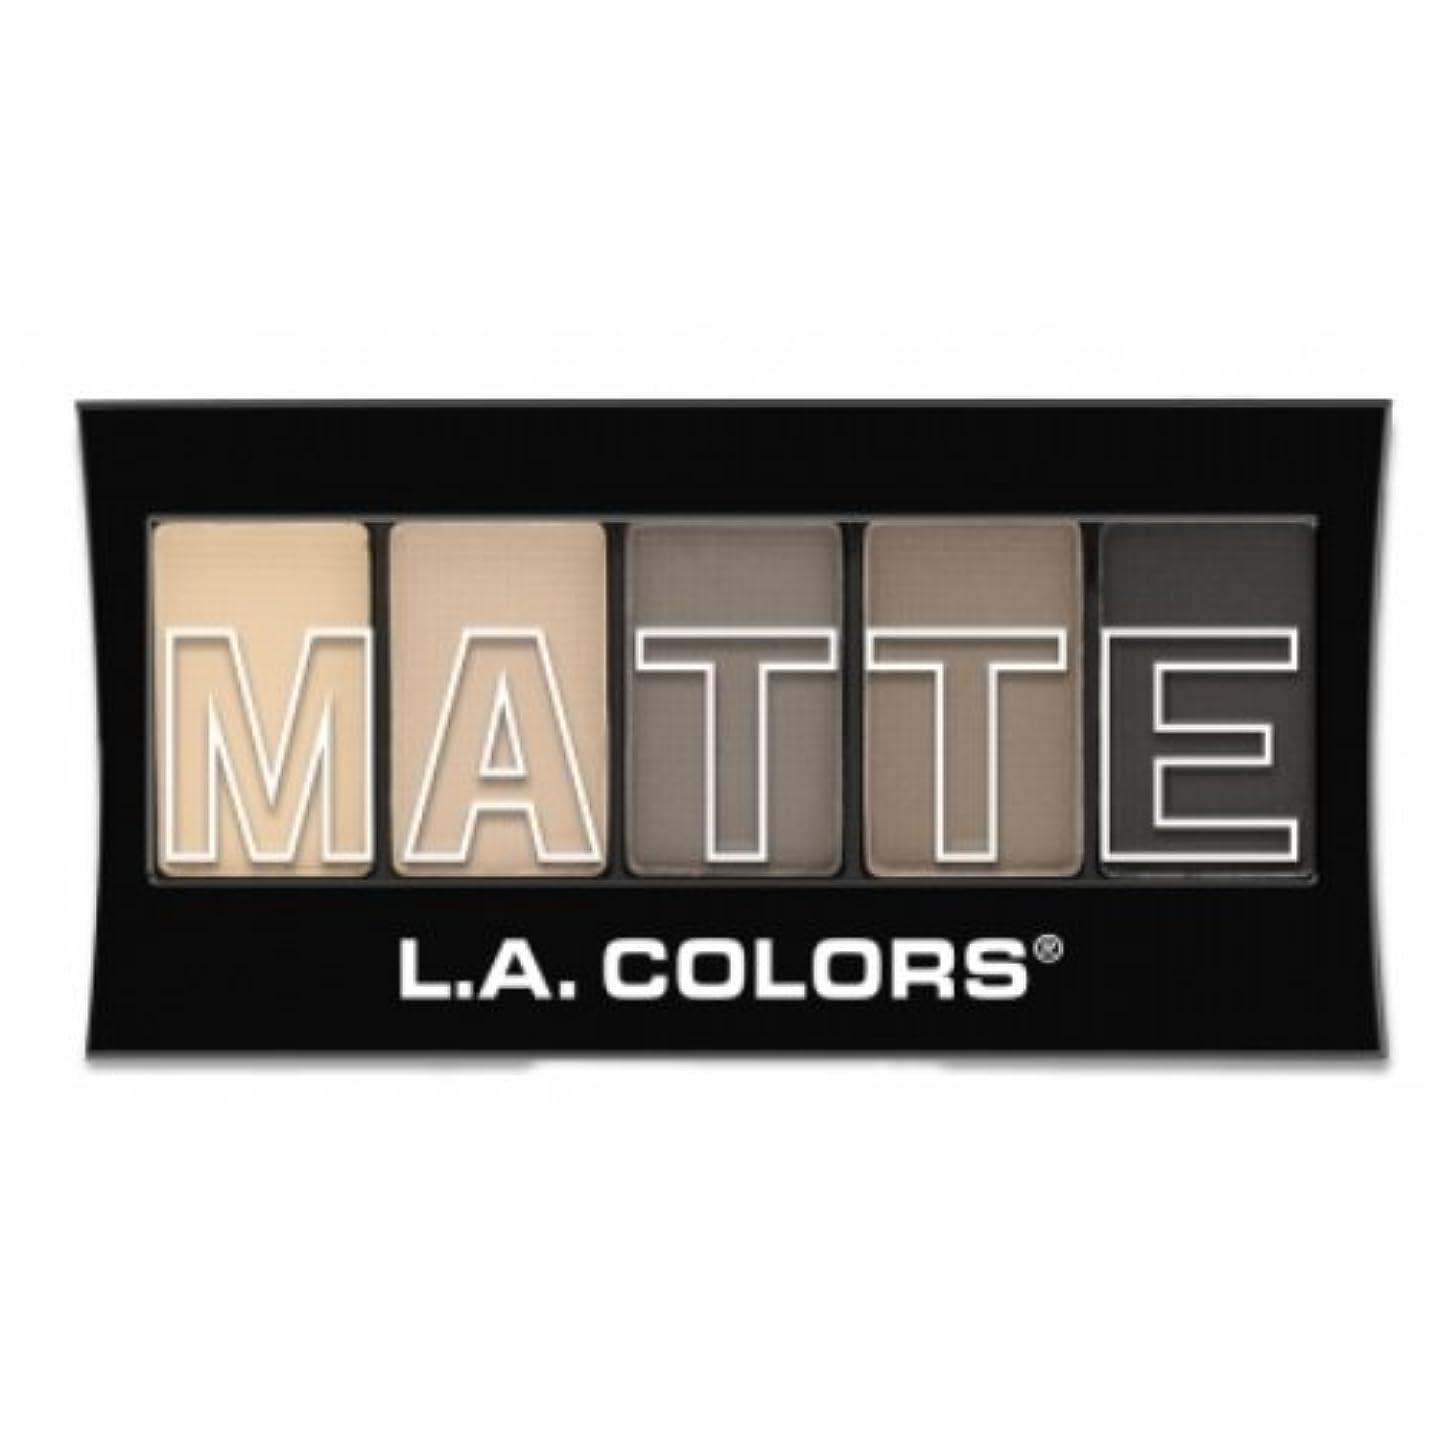 委員会低下収入(3 Pack) L.A. Colors Matte Eyeshadow - Nude Suede (並行輸入品)